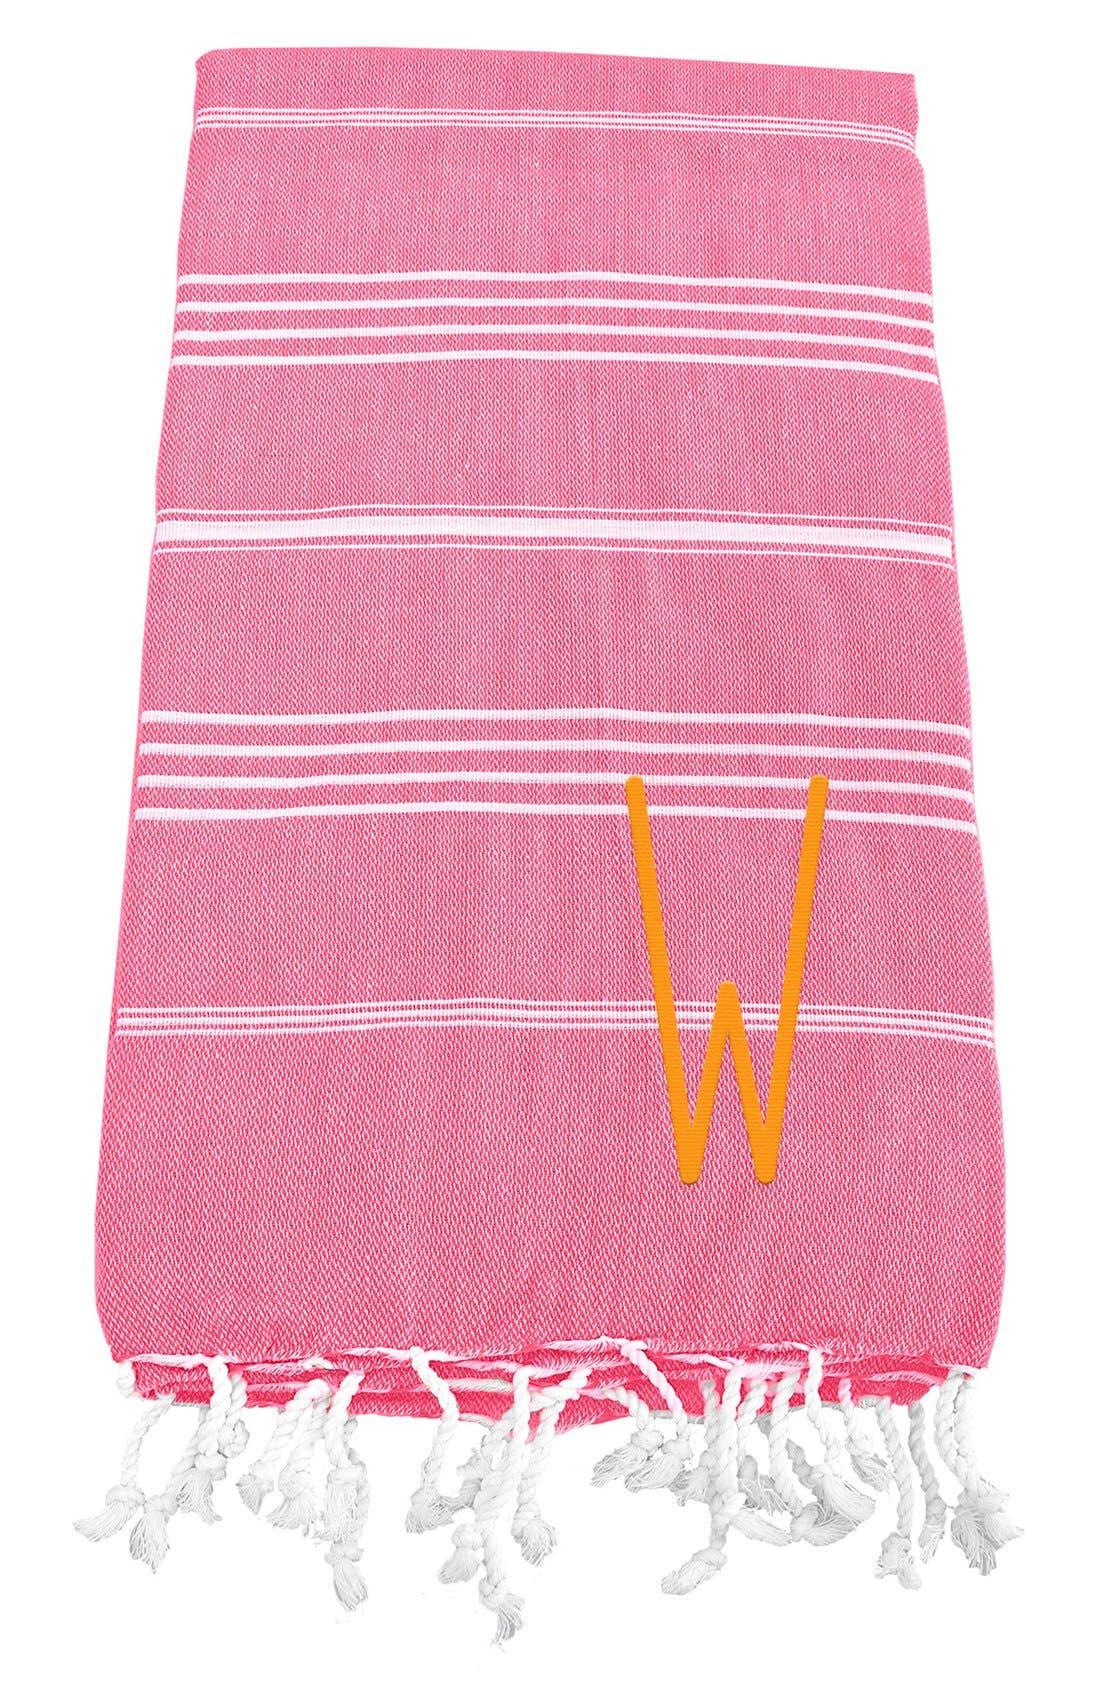 Monogram Turkish Cotton Towel,                             Main thumbnail 159, color,